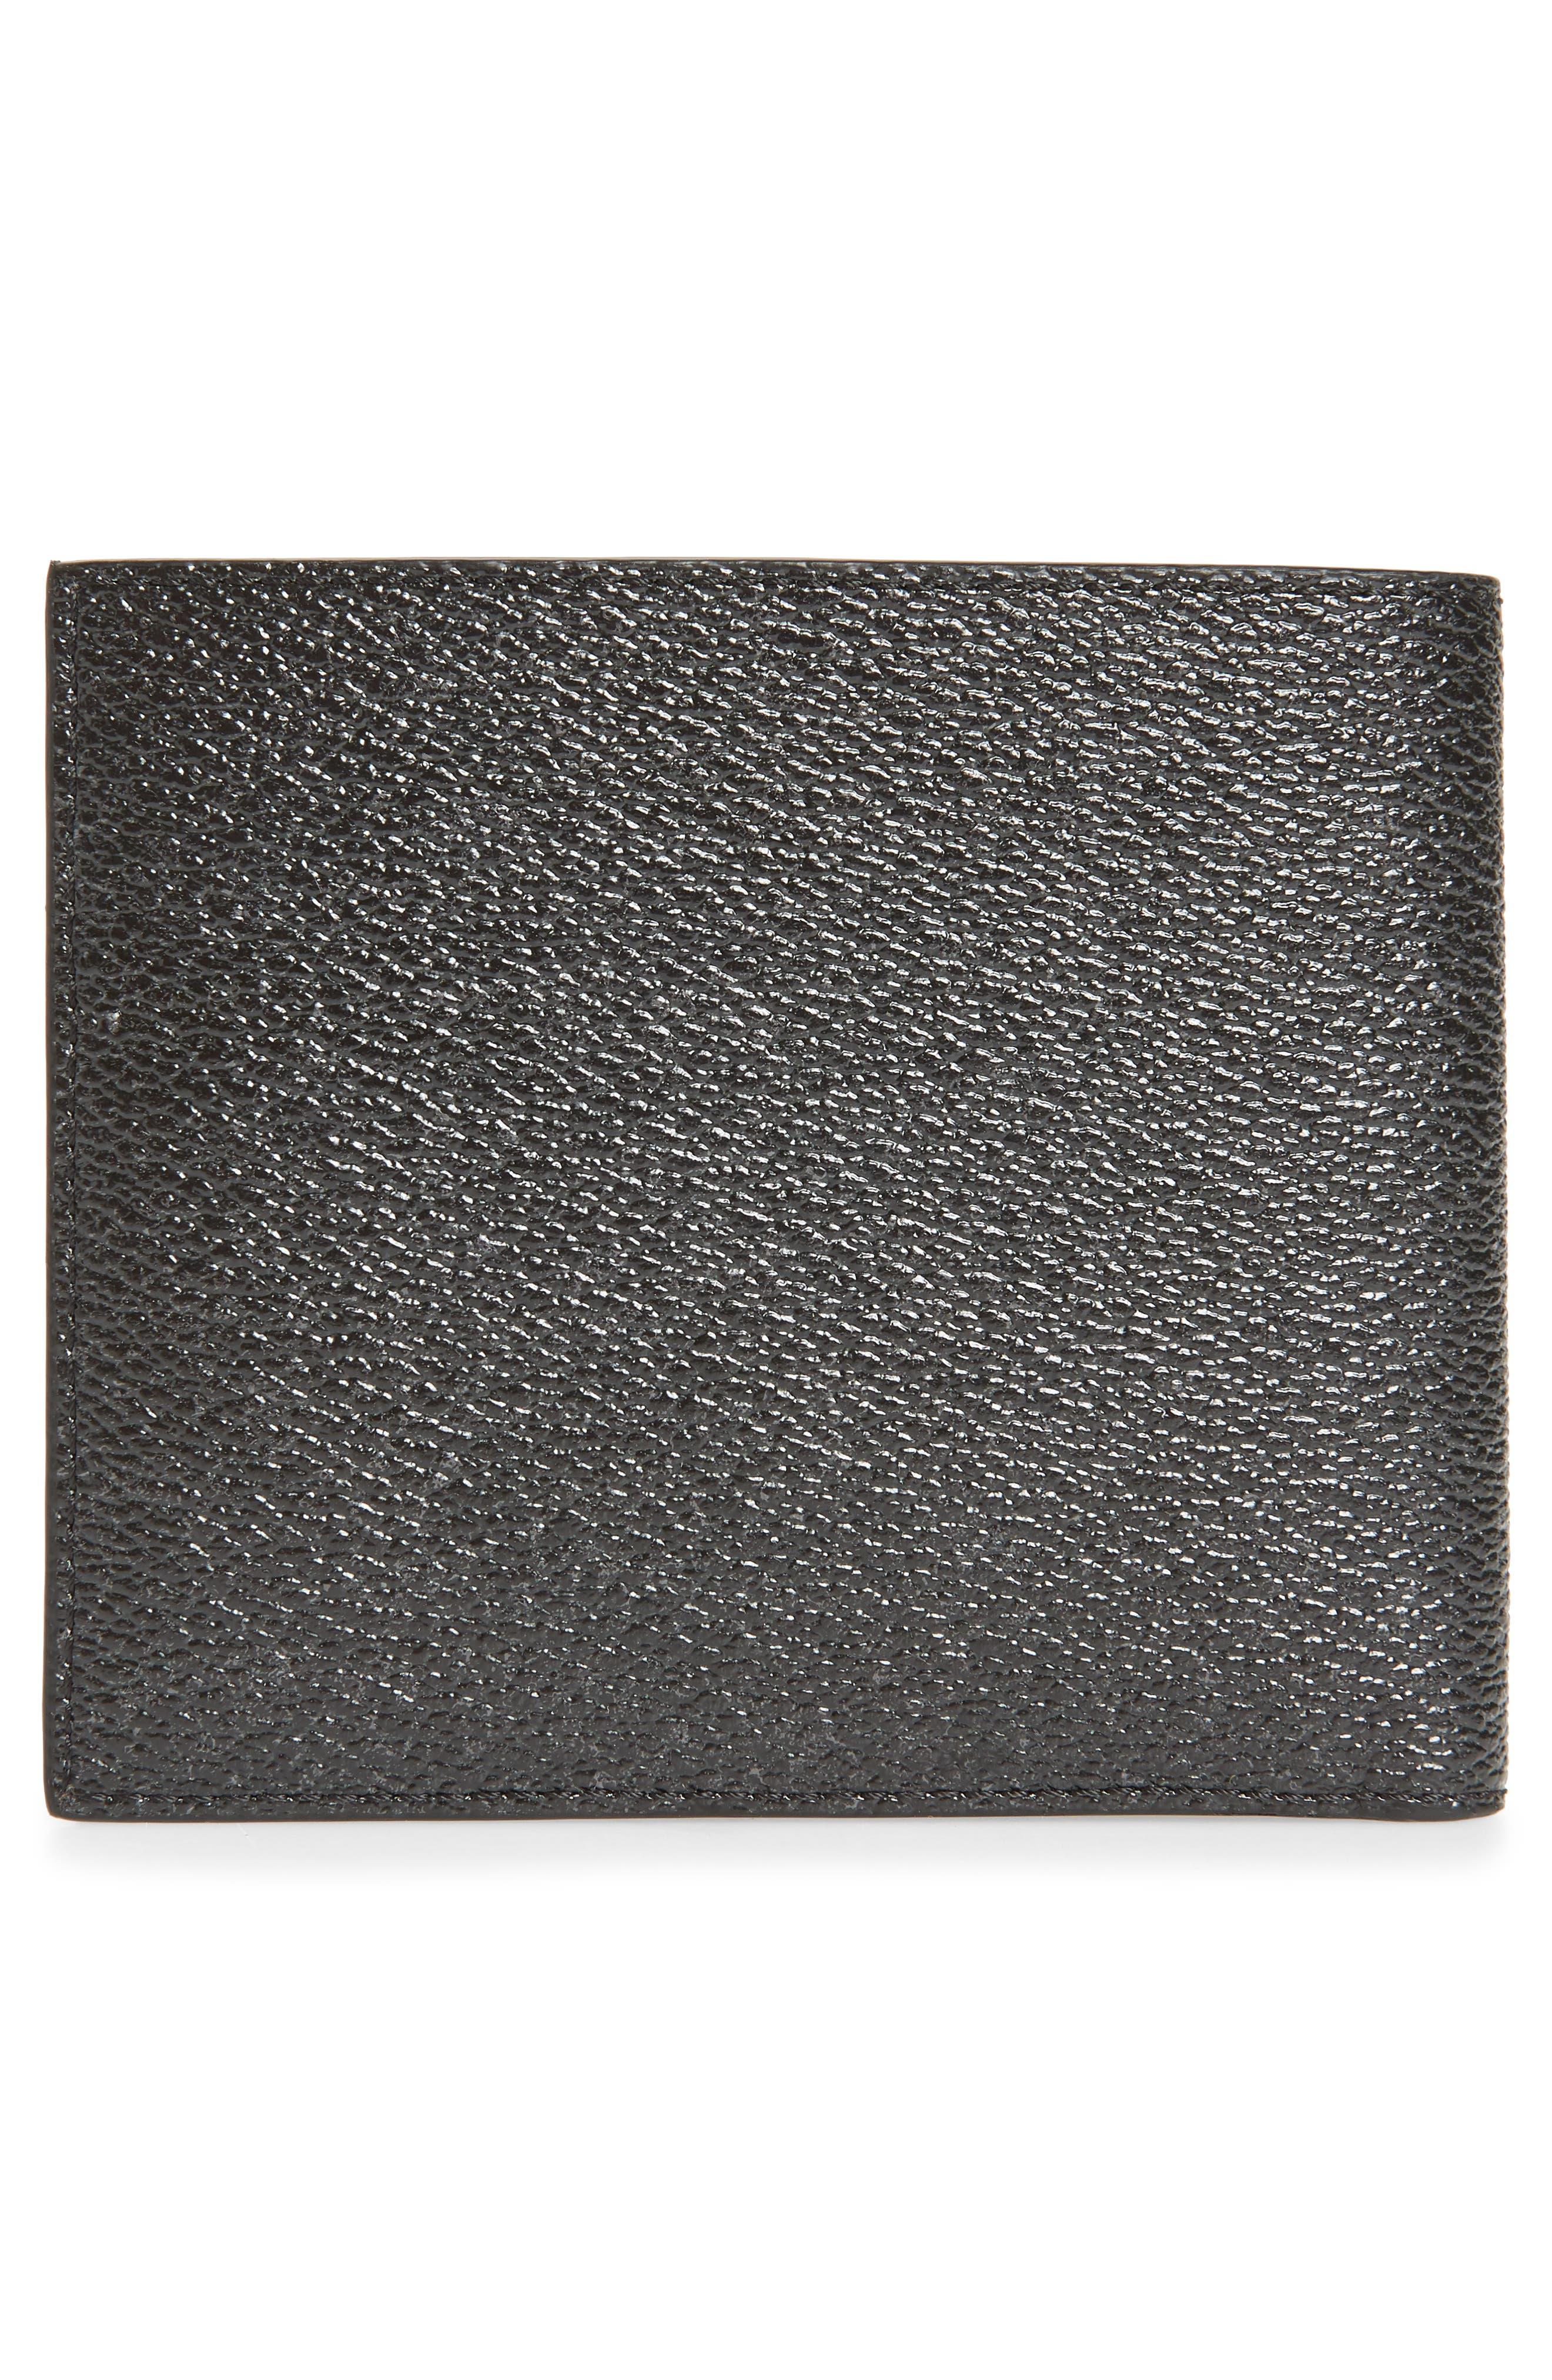 Lion Print Faux Leather Bifold Wallet,                             Alternate thumbnail 3, color,                             BLACK MULTI